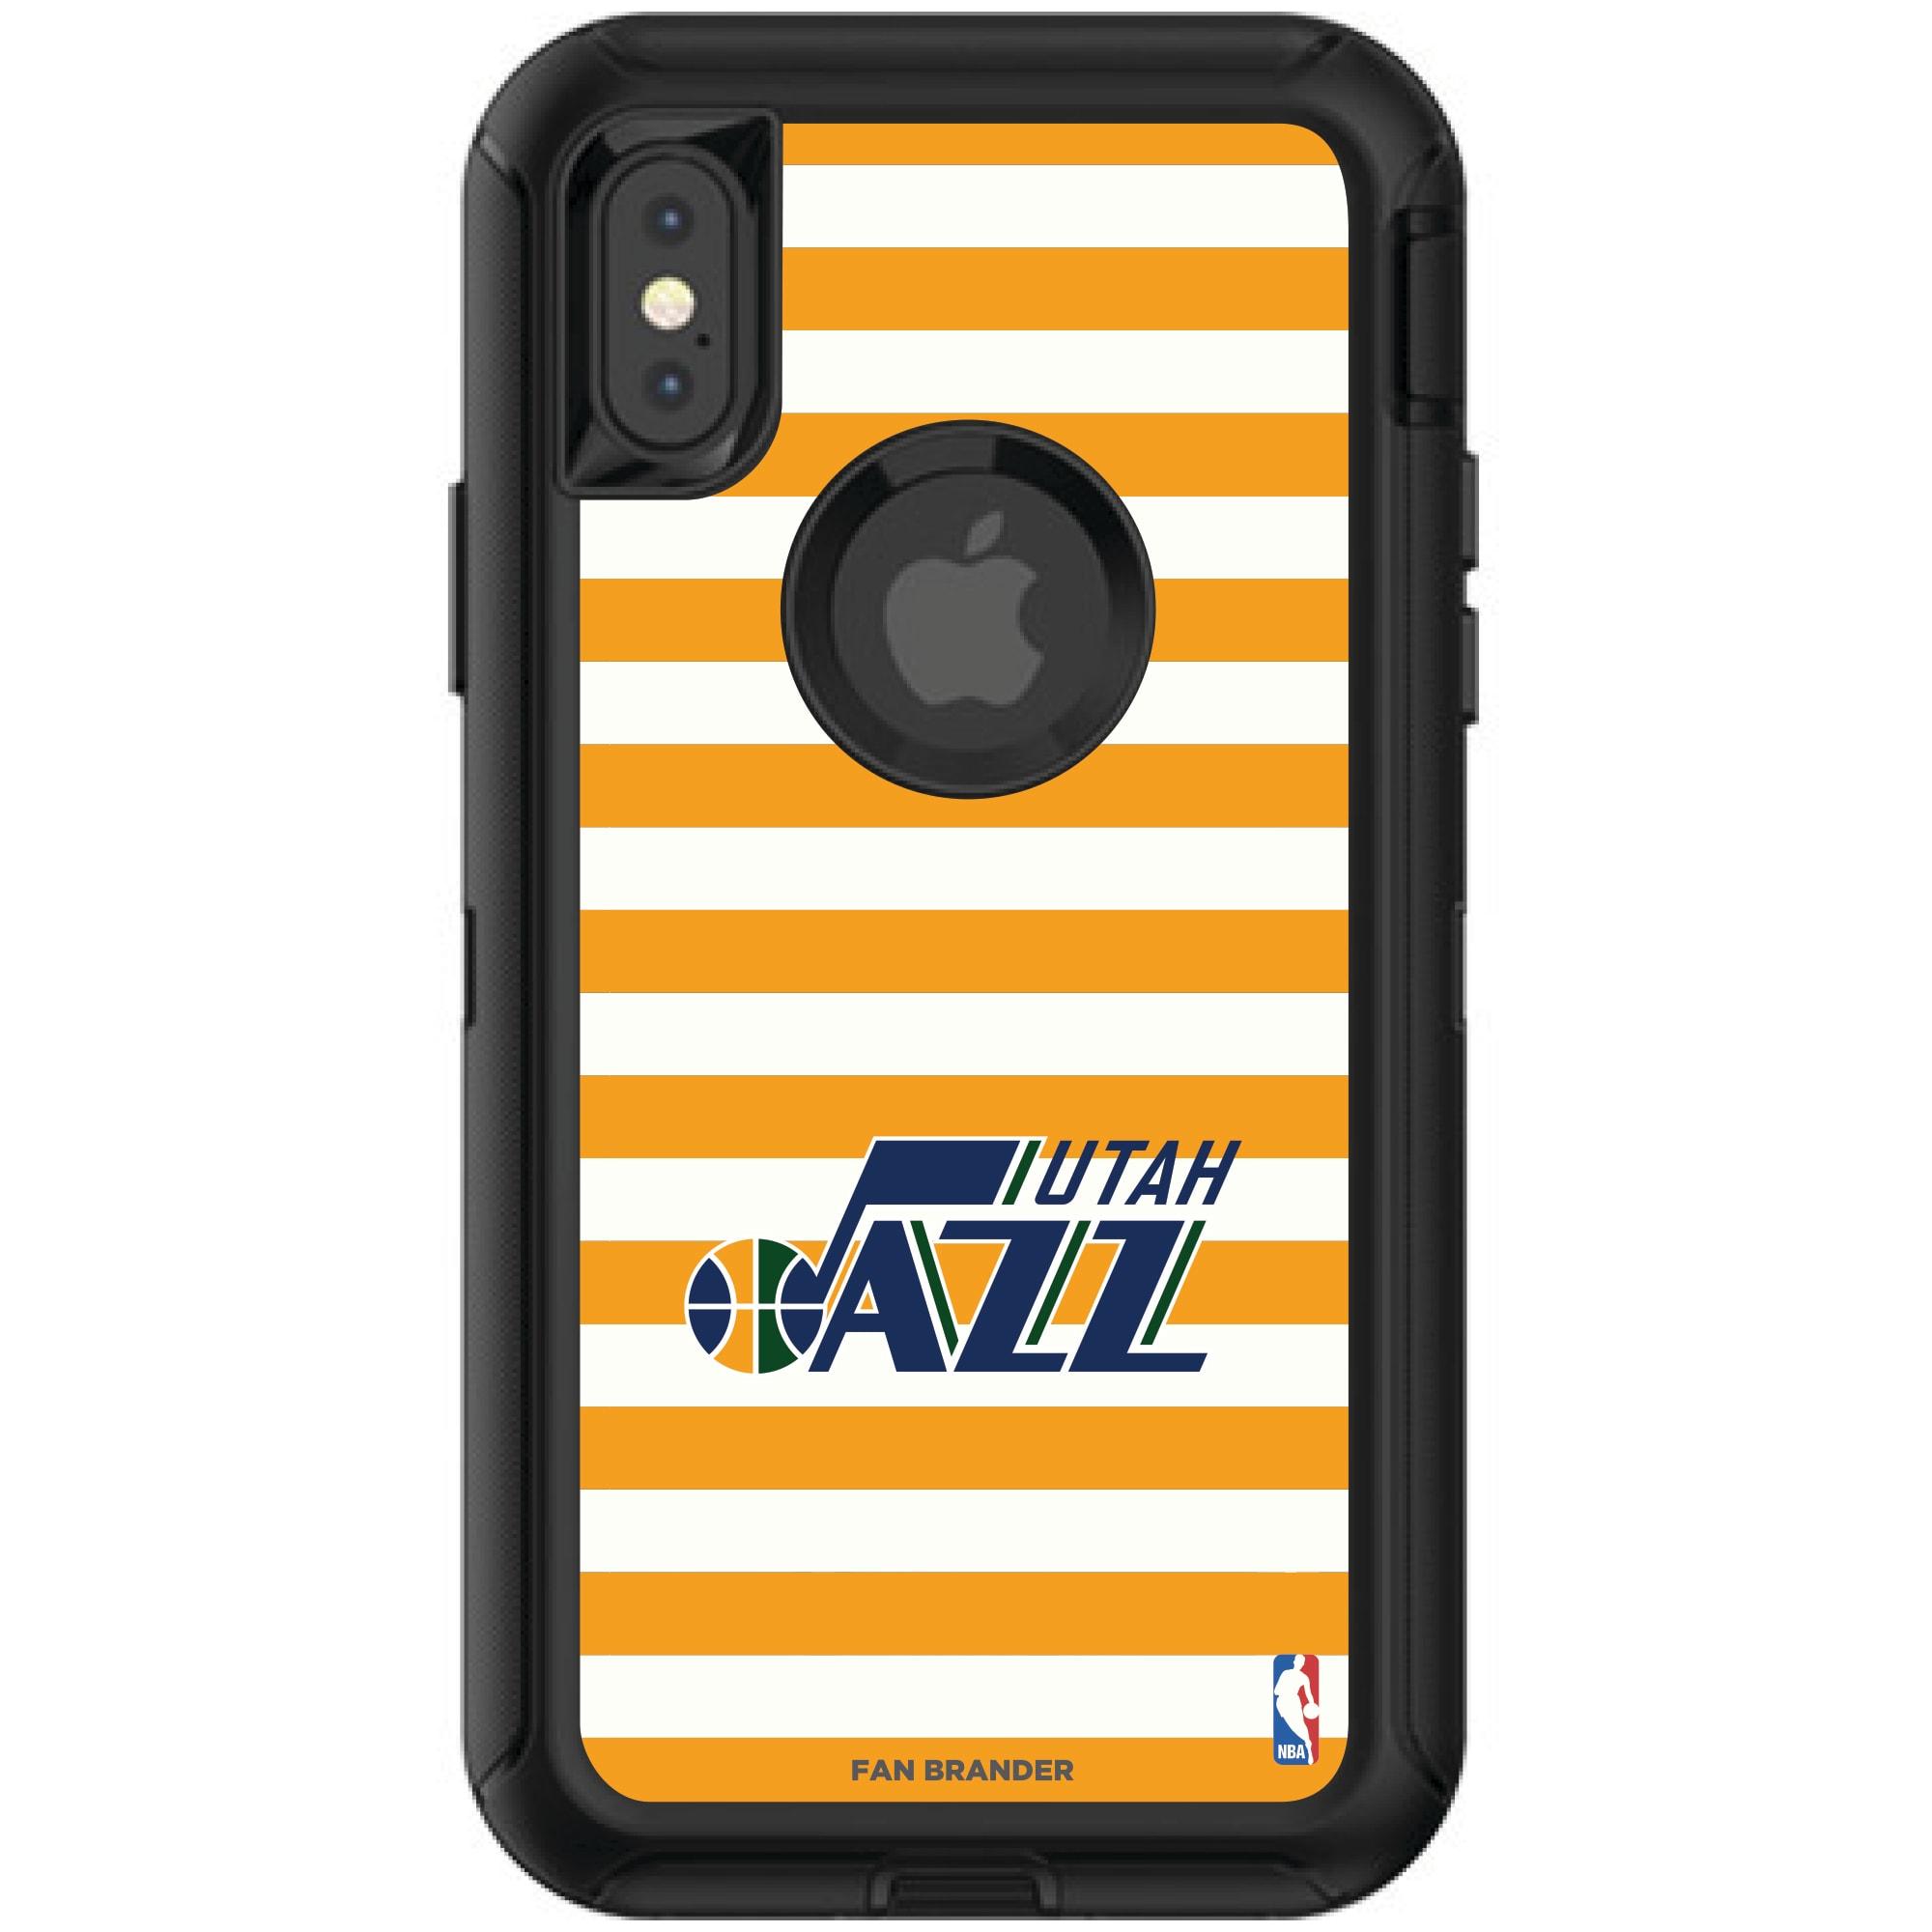 Utah Jazz OtterBox iPhone Defender Striped Design Case